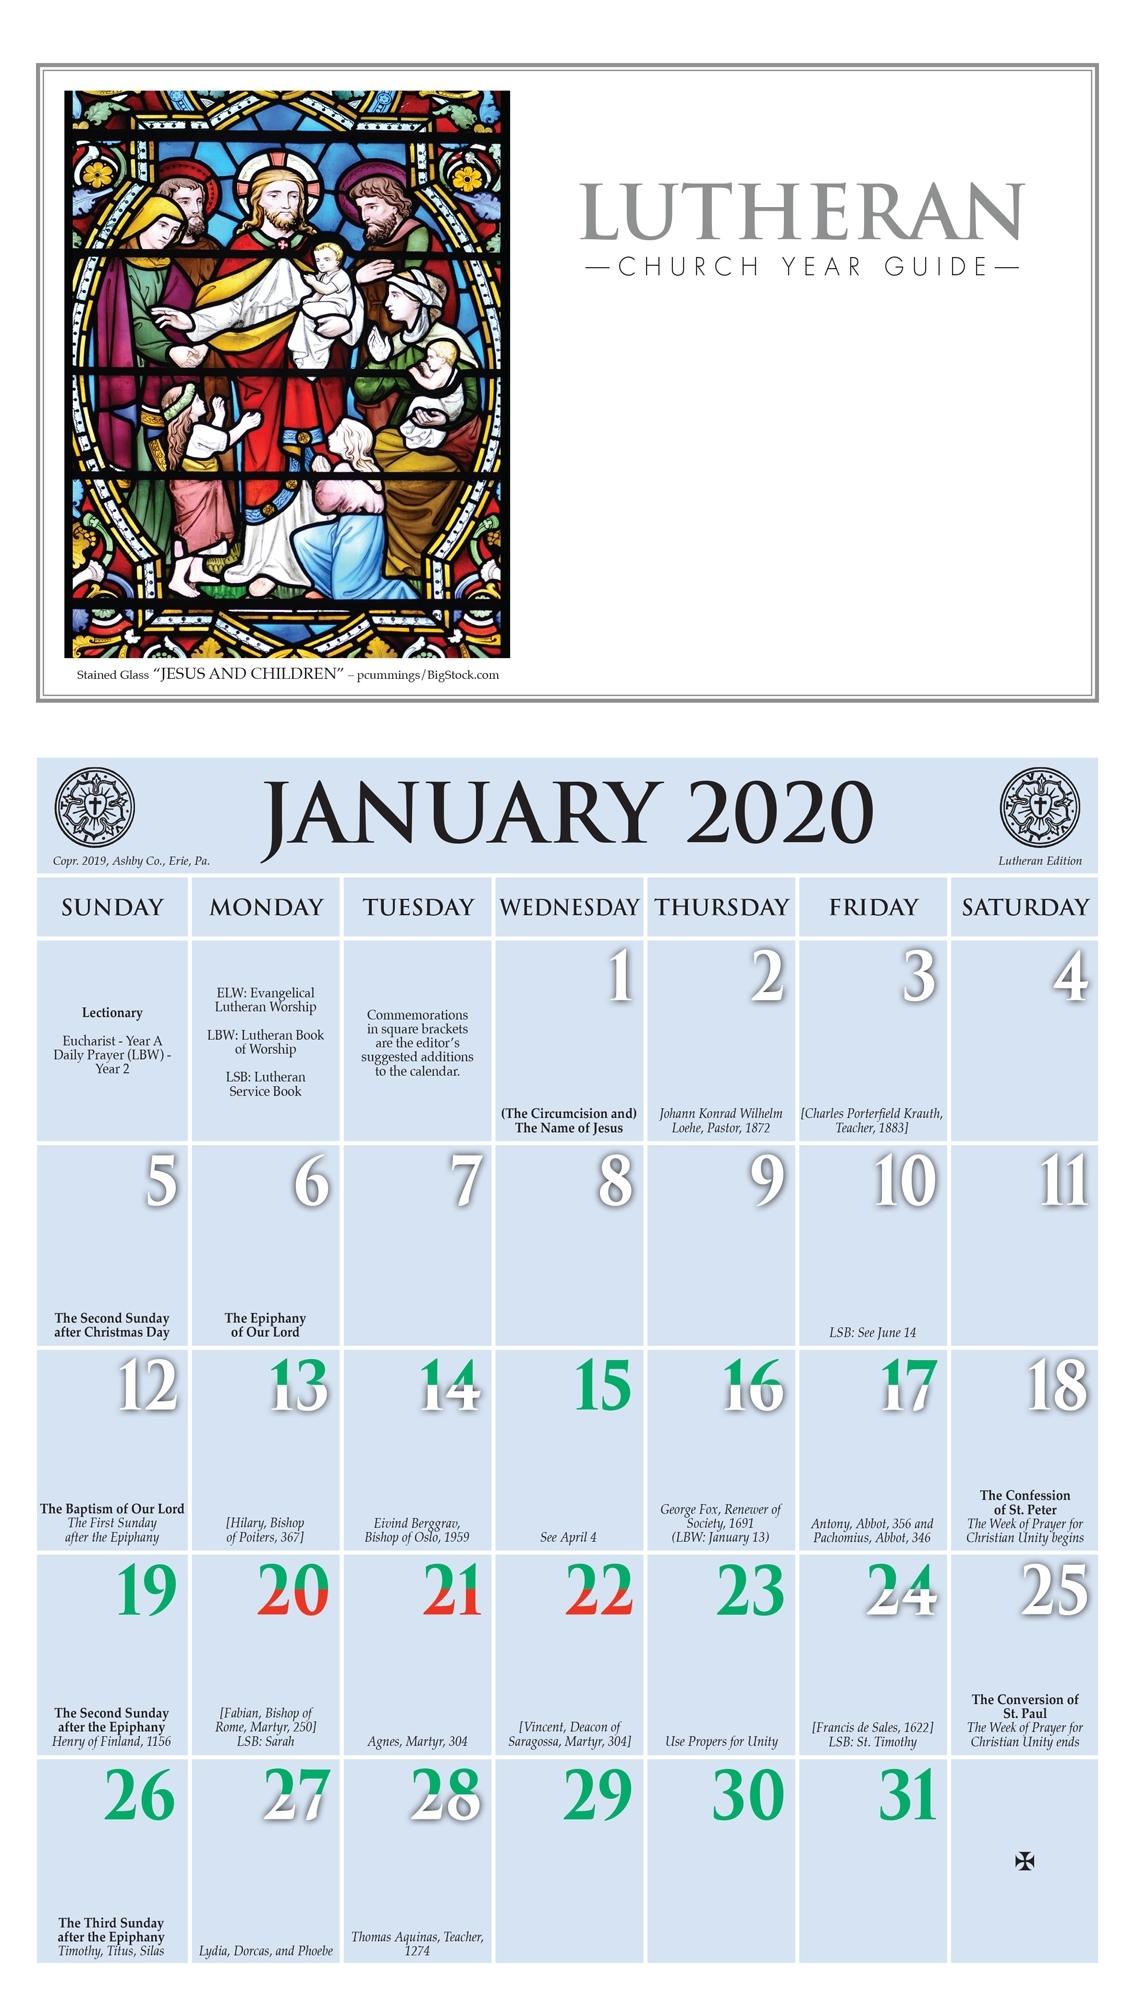 Church Calendar 2020 - Slubne-Suknie throughout Liturgical Calendar 2020 Pdf Lutheran